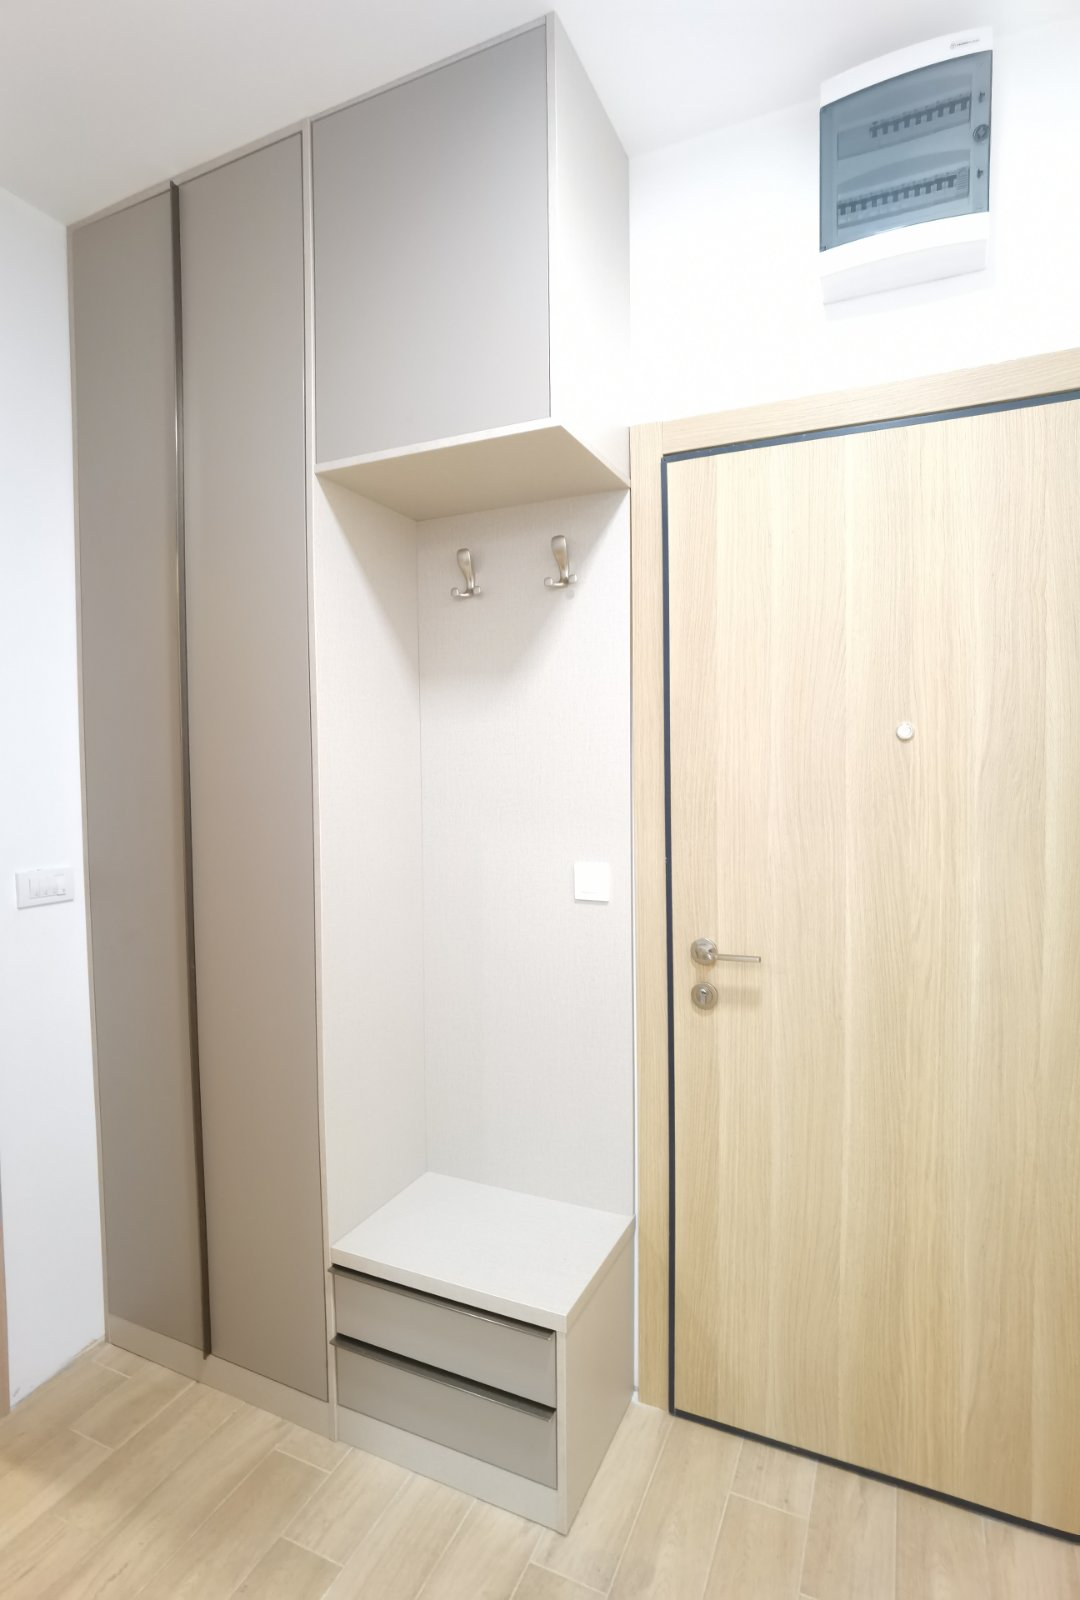 amforaproperty.com/JEDNOSOBAN STAN 41 M2 + TERASA 8 M2 - THE OLD BAKERY - BUDVA